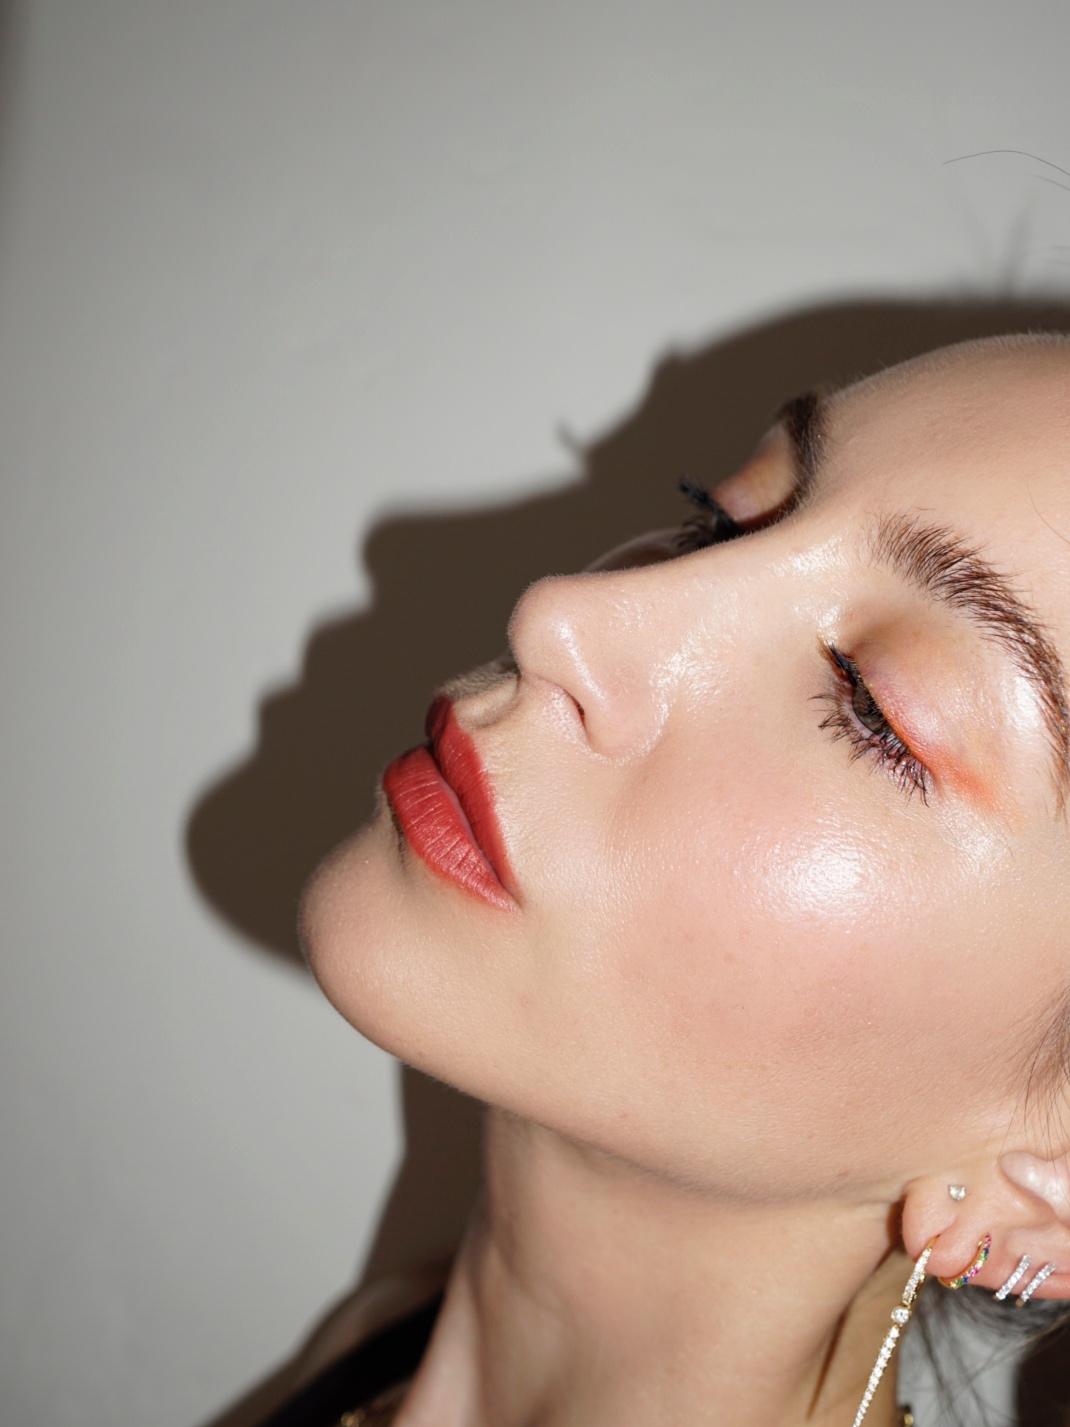 Red lip for summer - nikkideroest.com